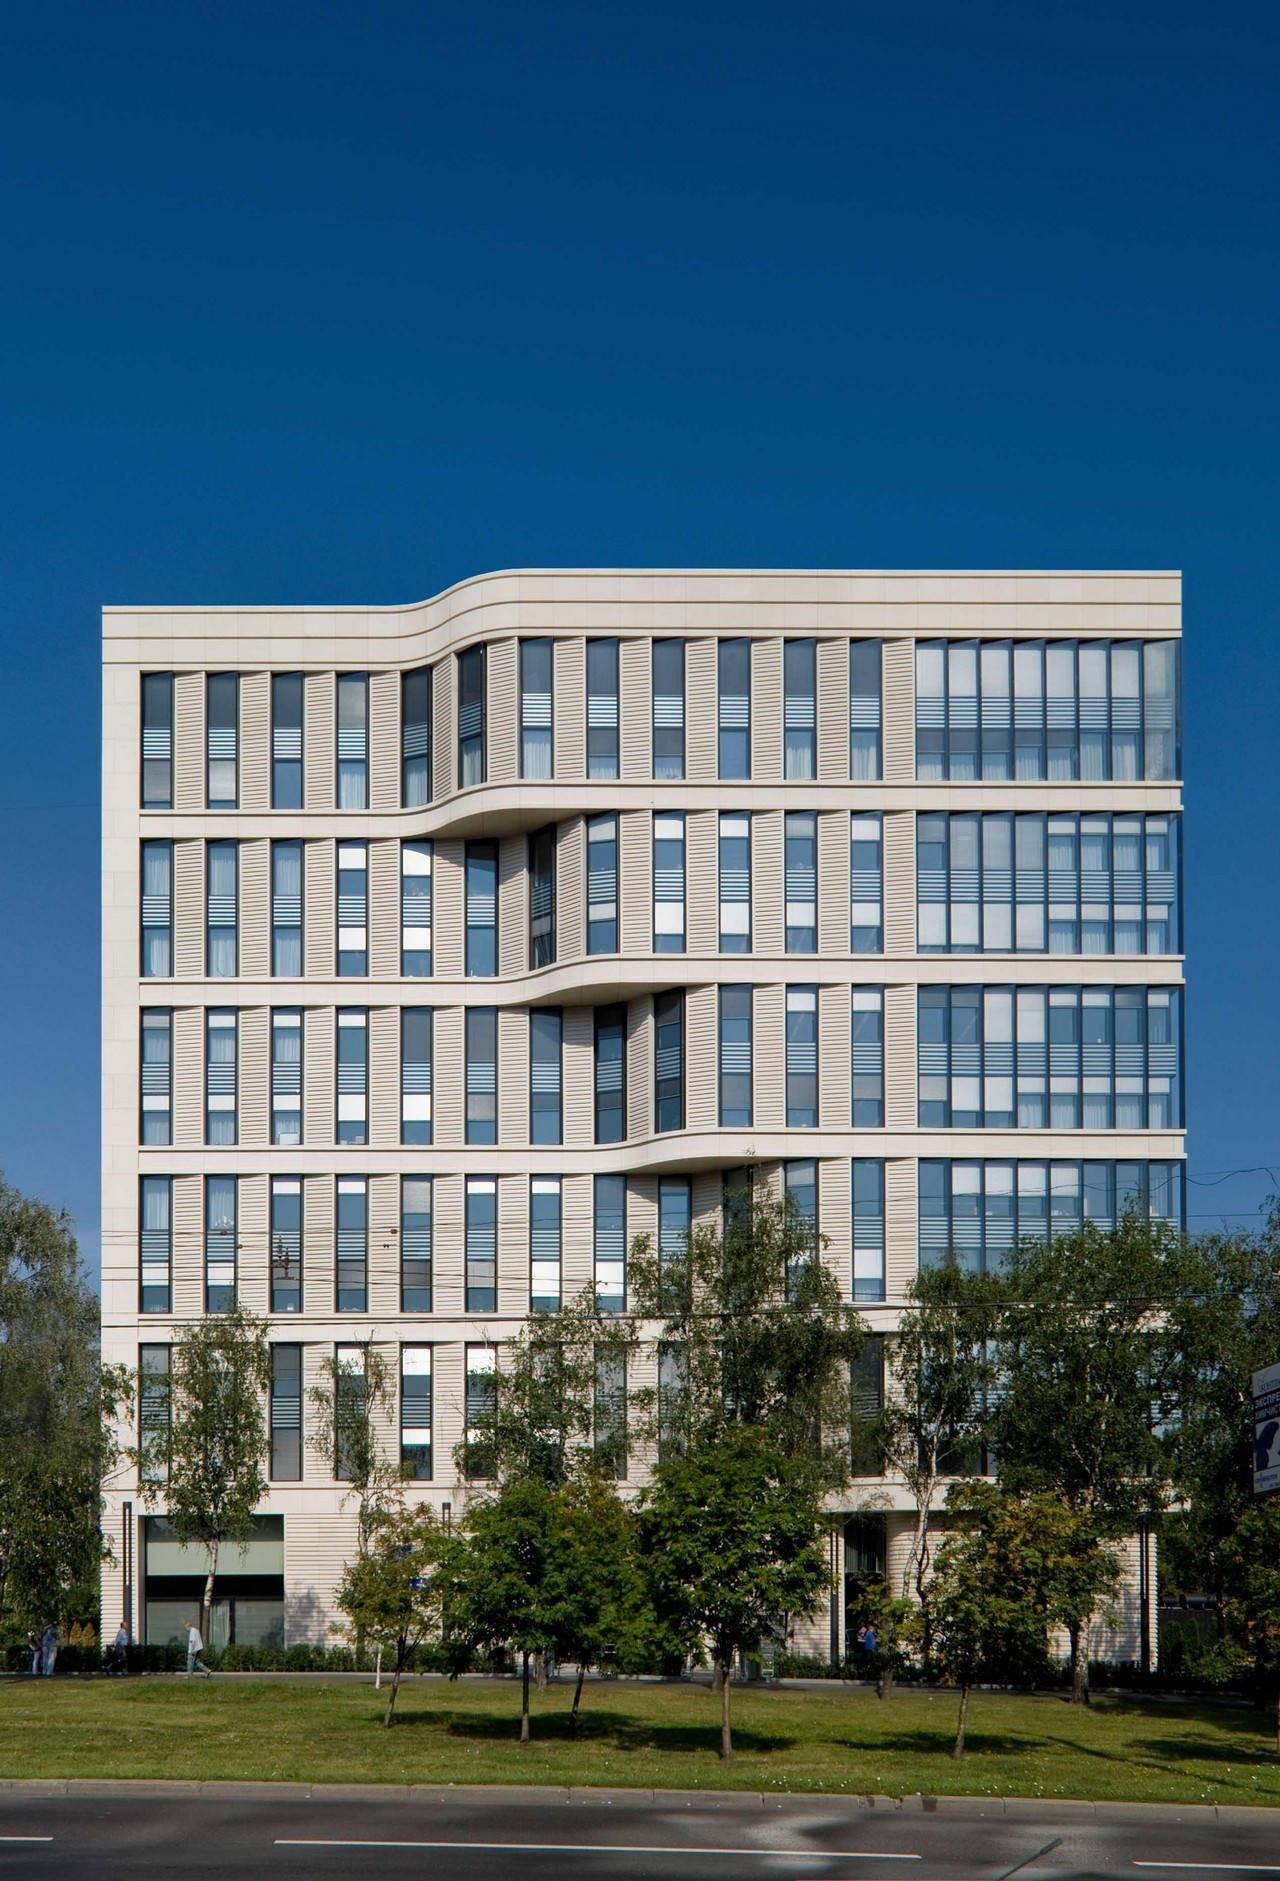 Office Building On Leninsky / Sergey Tchoban + Sergey Kuznetsov, Courtesy of Sergey Tchoban & Sergey Kuznetsov